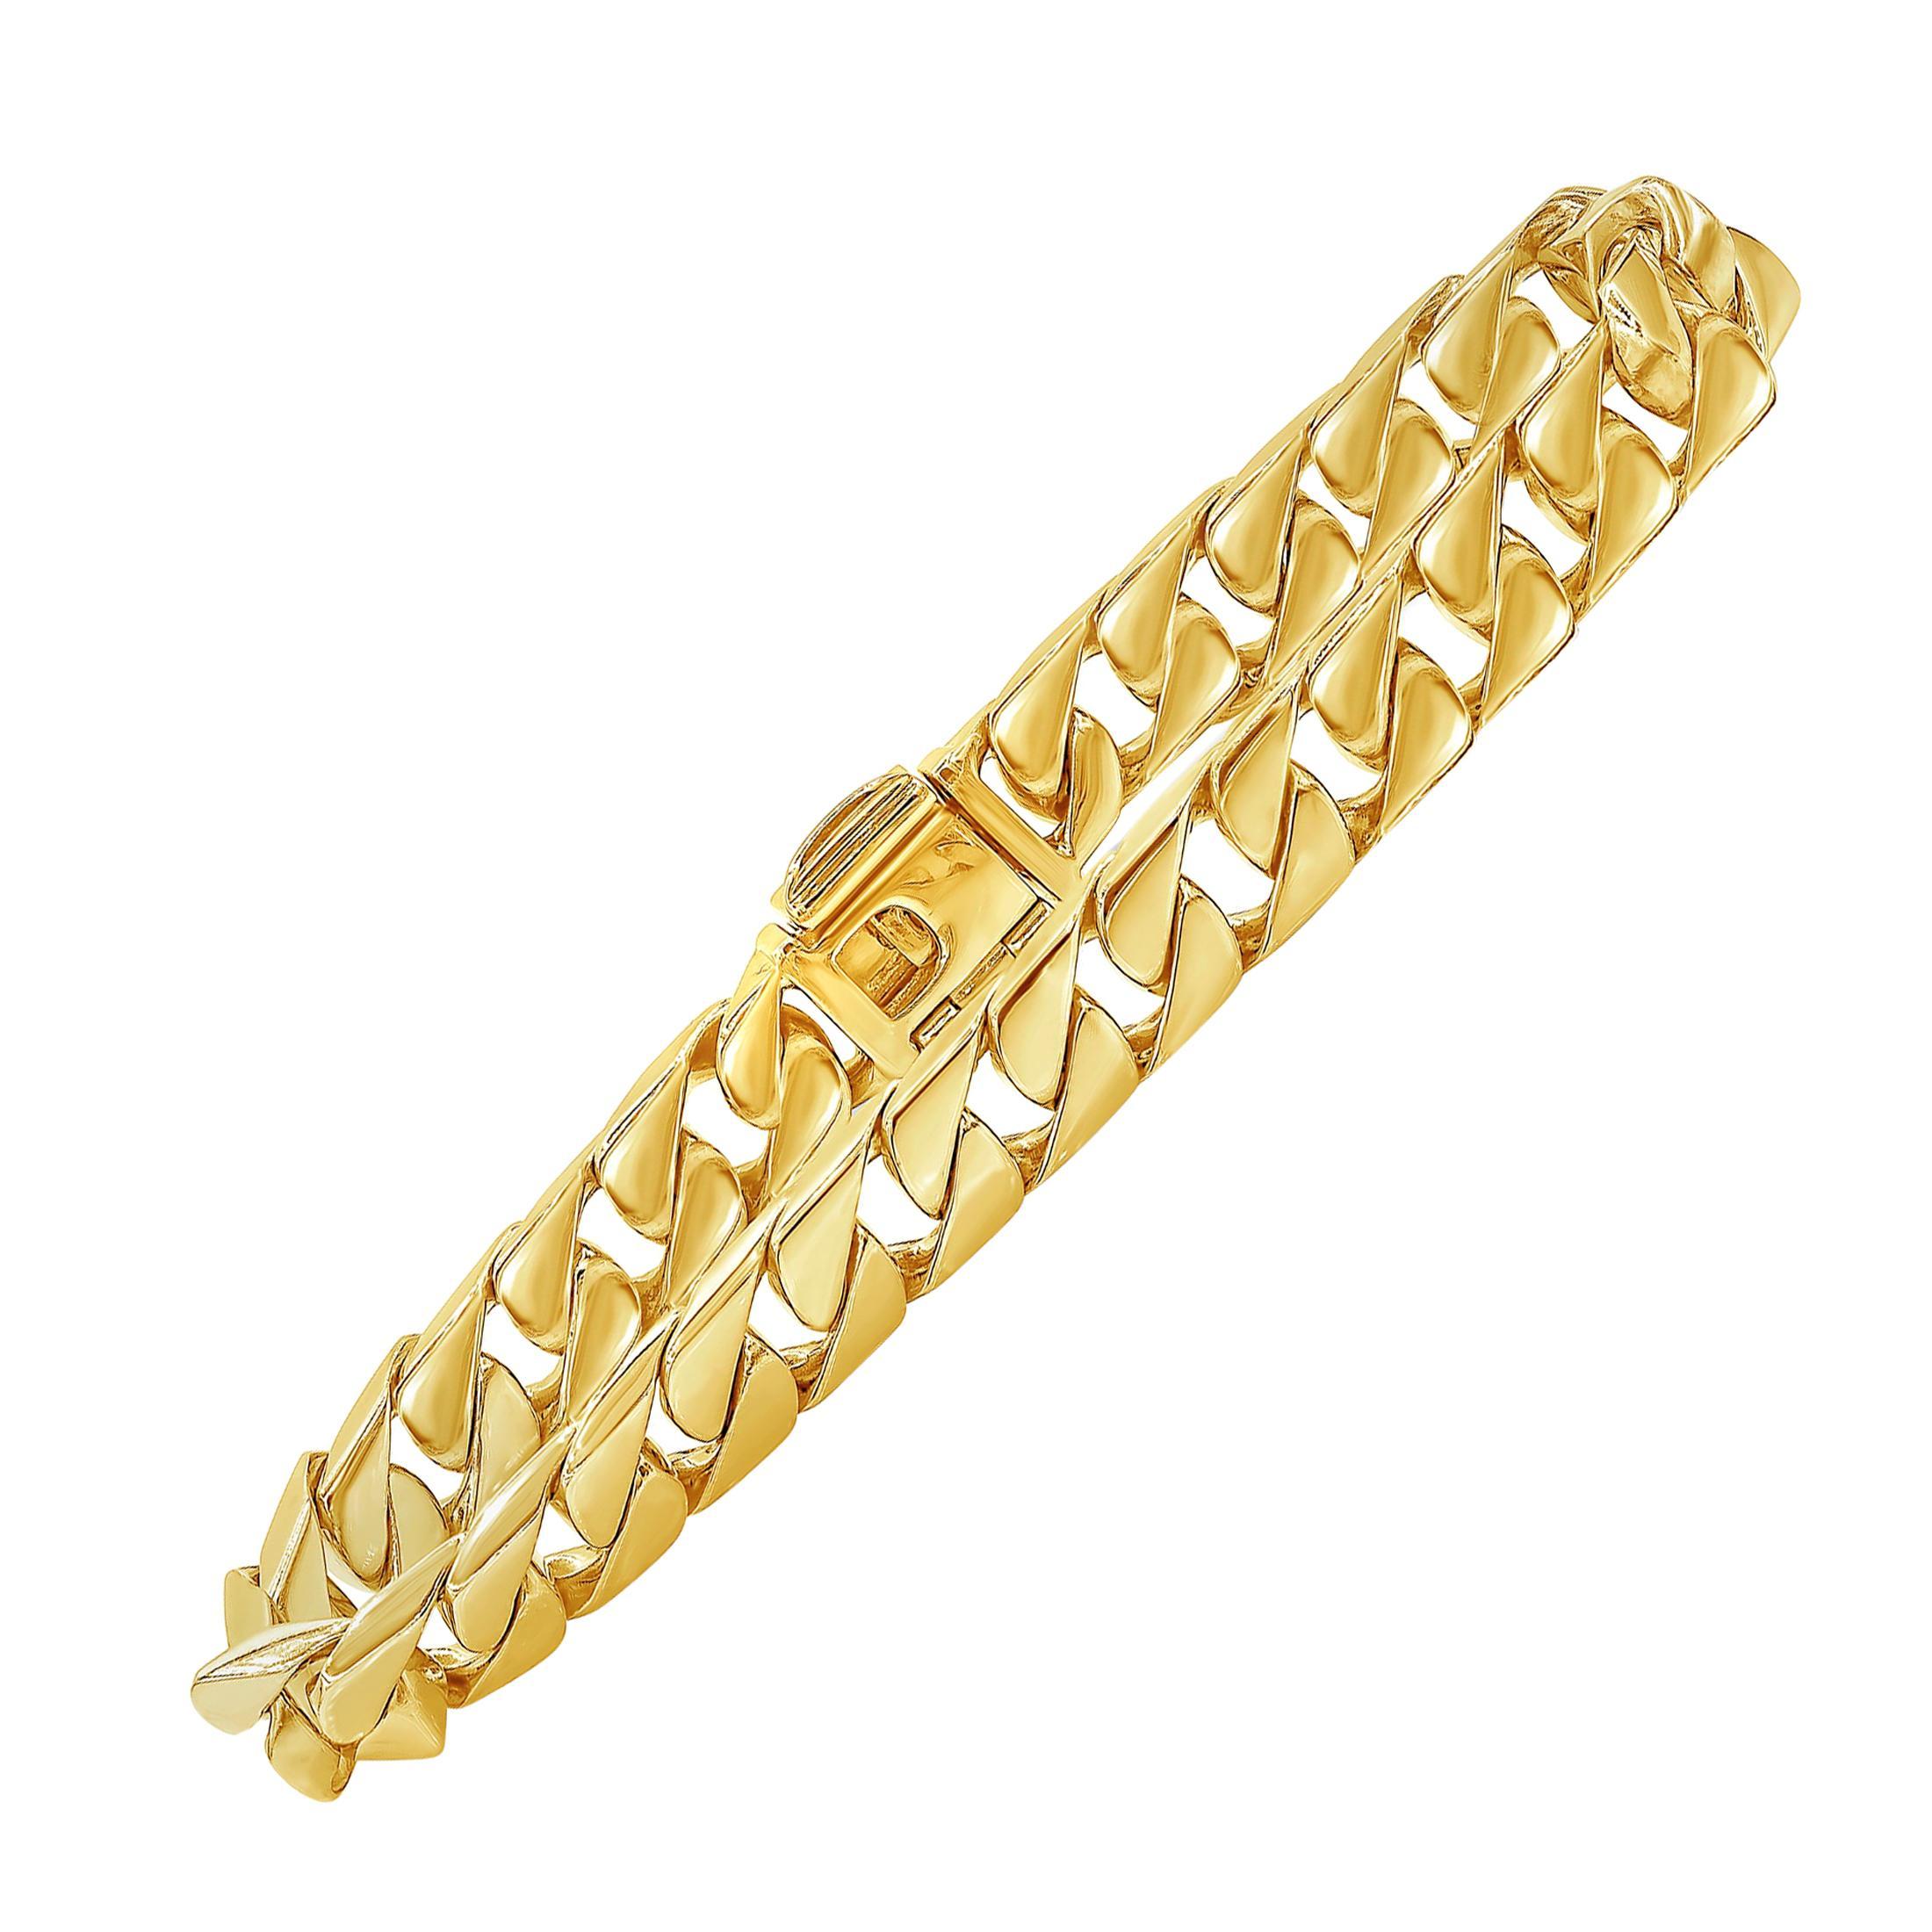 Tiffany & Co. 18 Karat Yellow Gold Cuban Link Bracelet